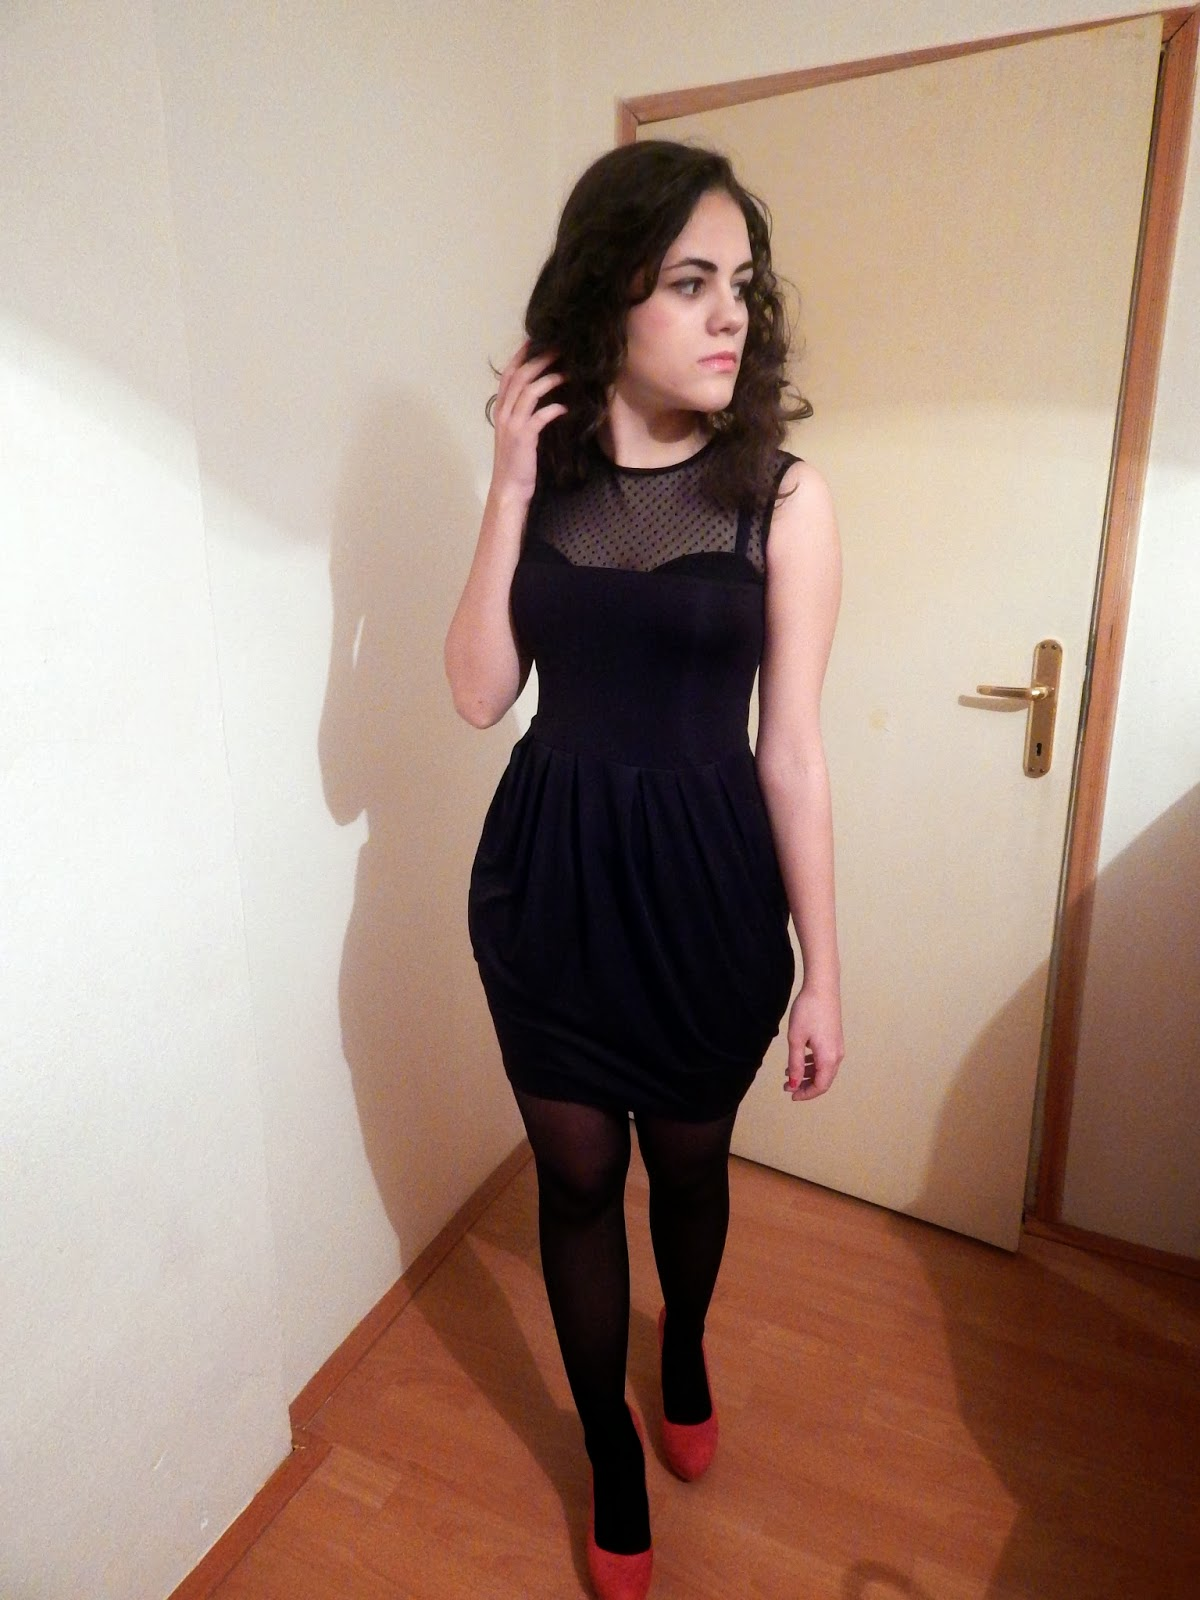 c8f8b9578580 hot pink Nine West pumps – black Miss Selfridge dress – black Chanel bag. Bright  pink heels were contrast nicely with black dress.